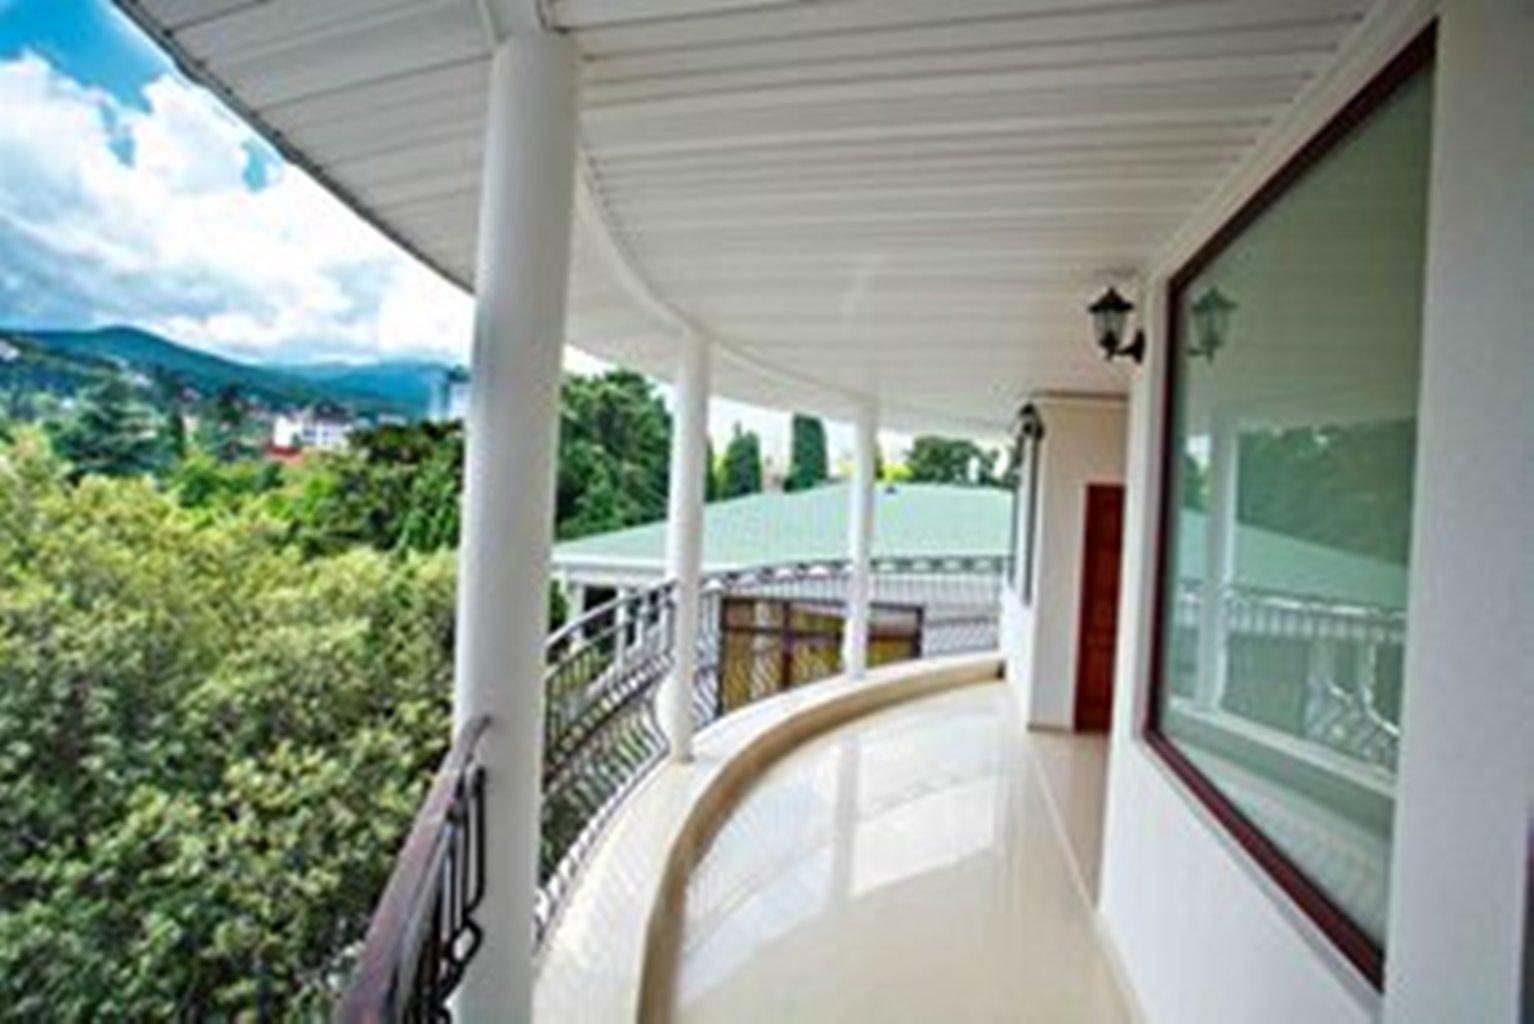 Balcony - picture of slavonic alliance hotel, yalta - tripad.